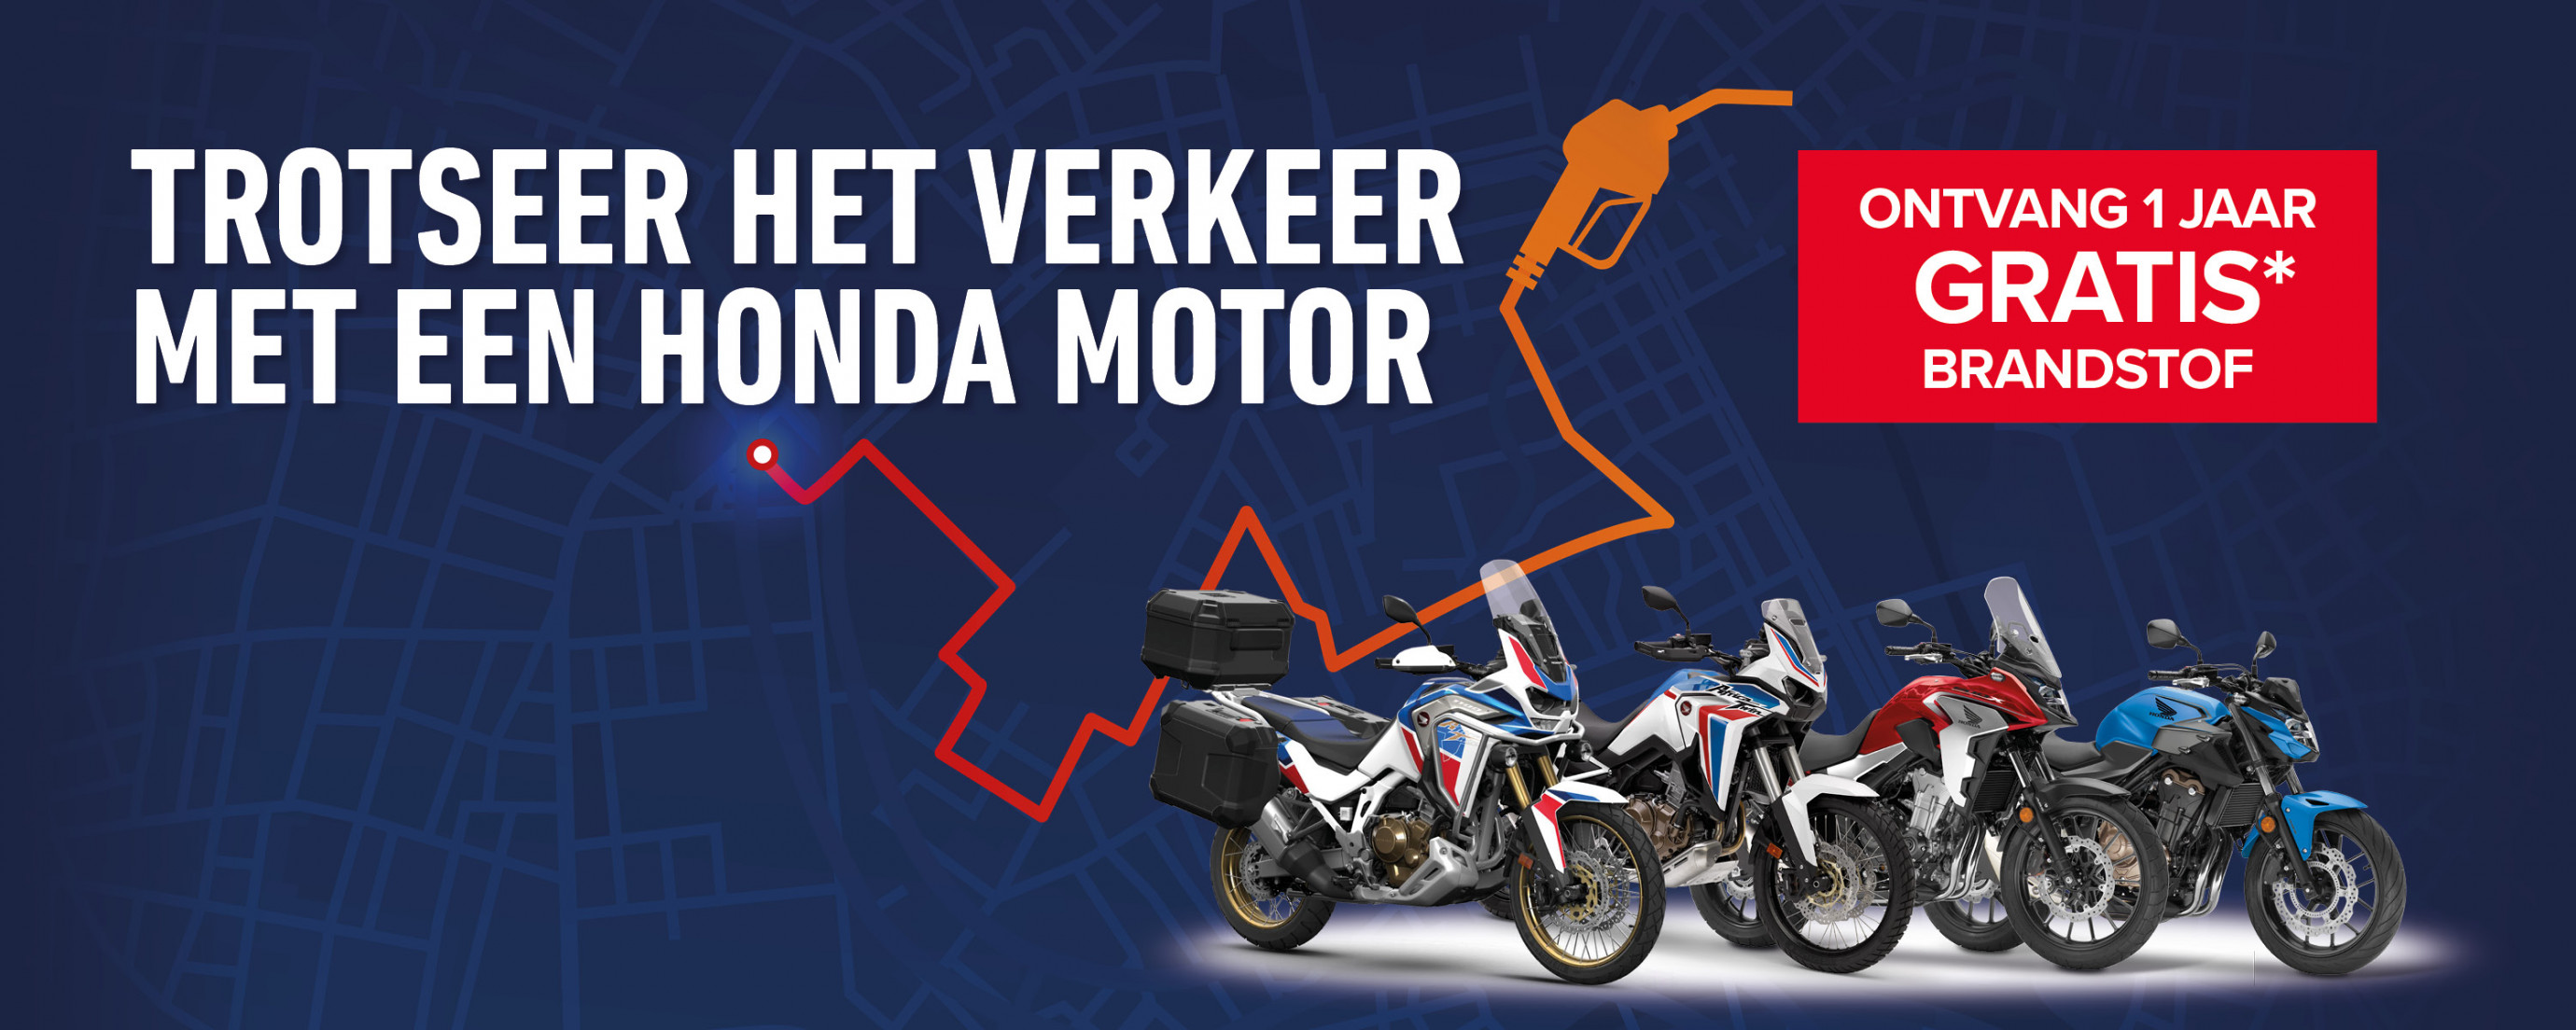 HondaMobility21_3000x1200NEDsterretje[4][1]